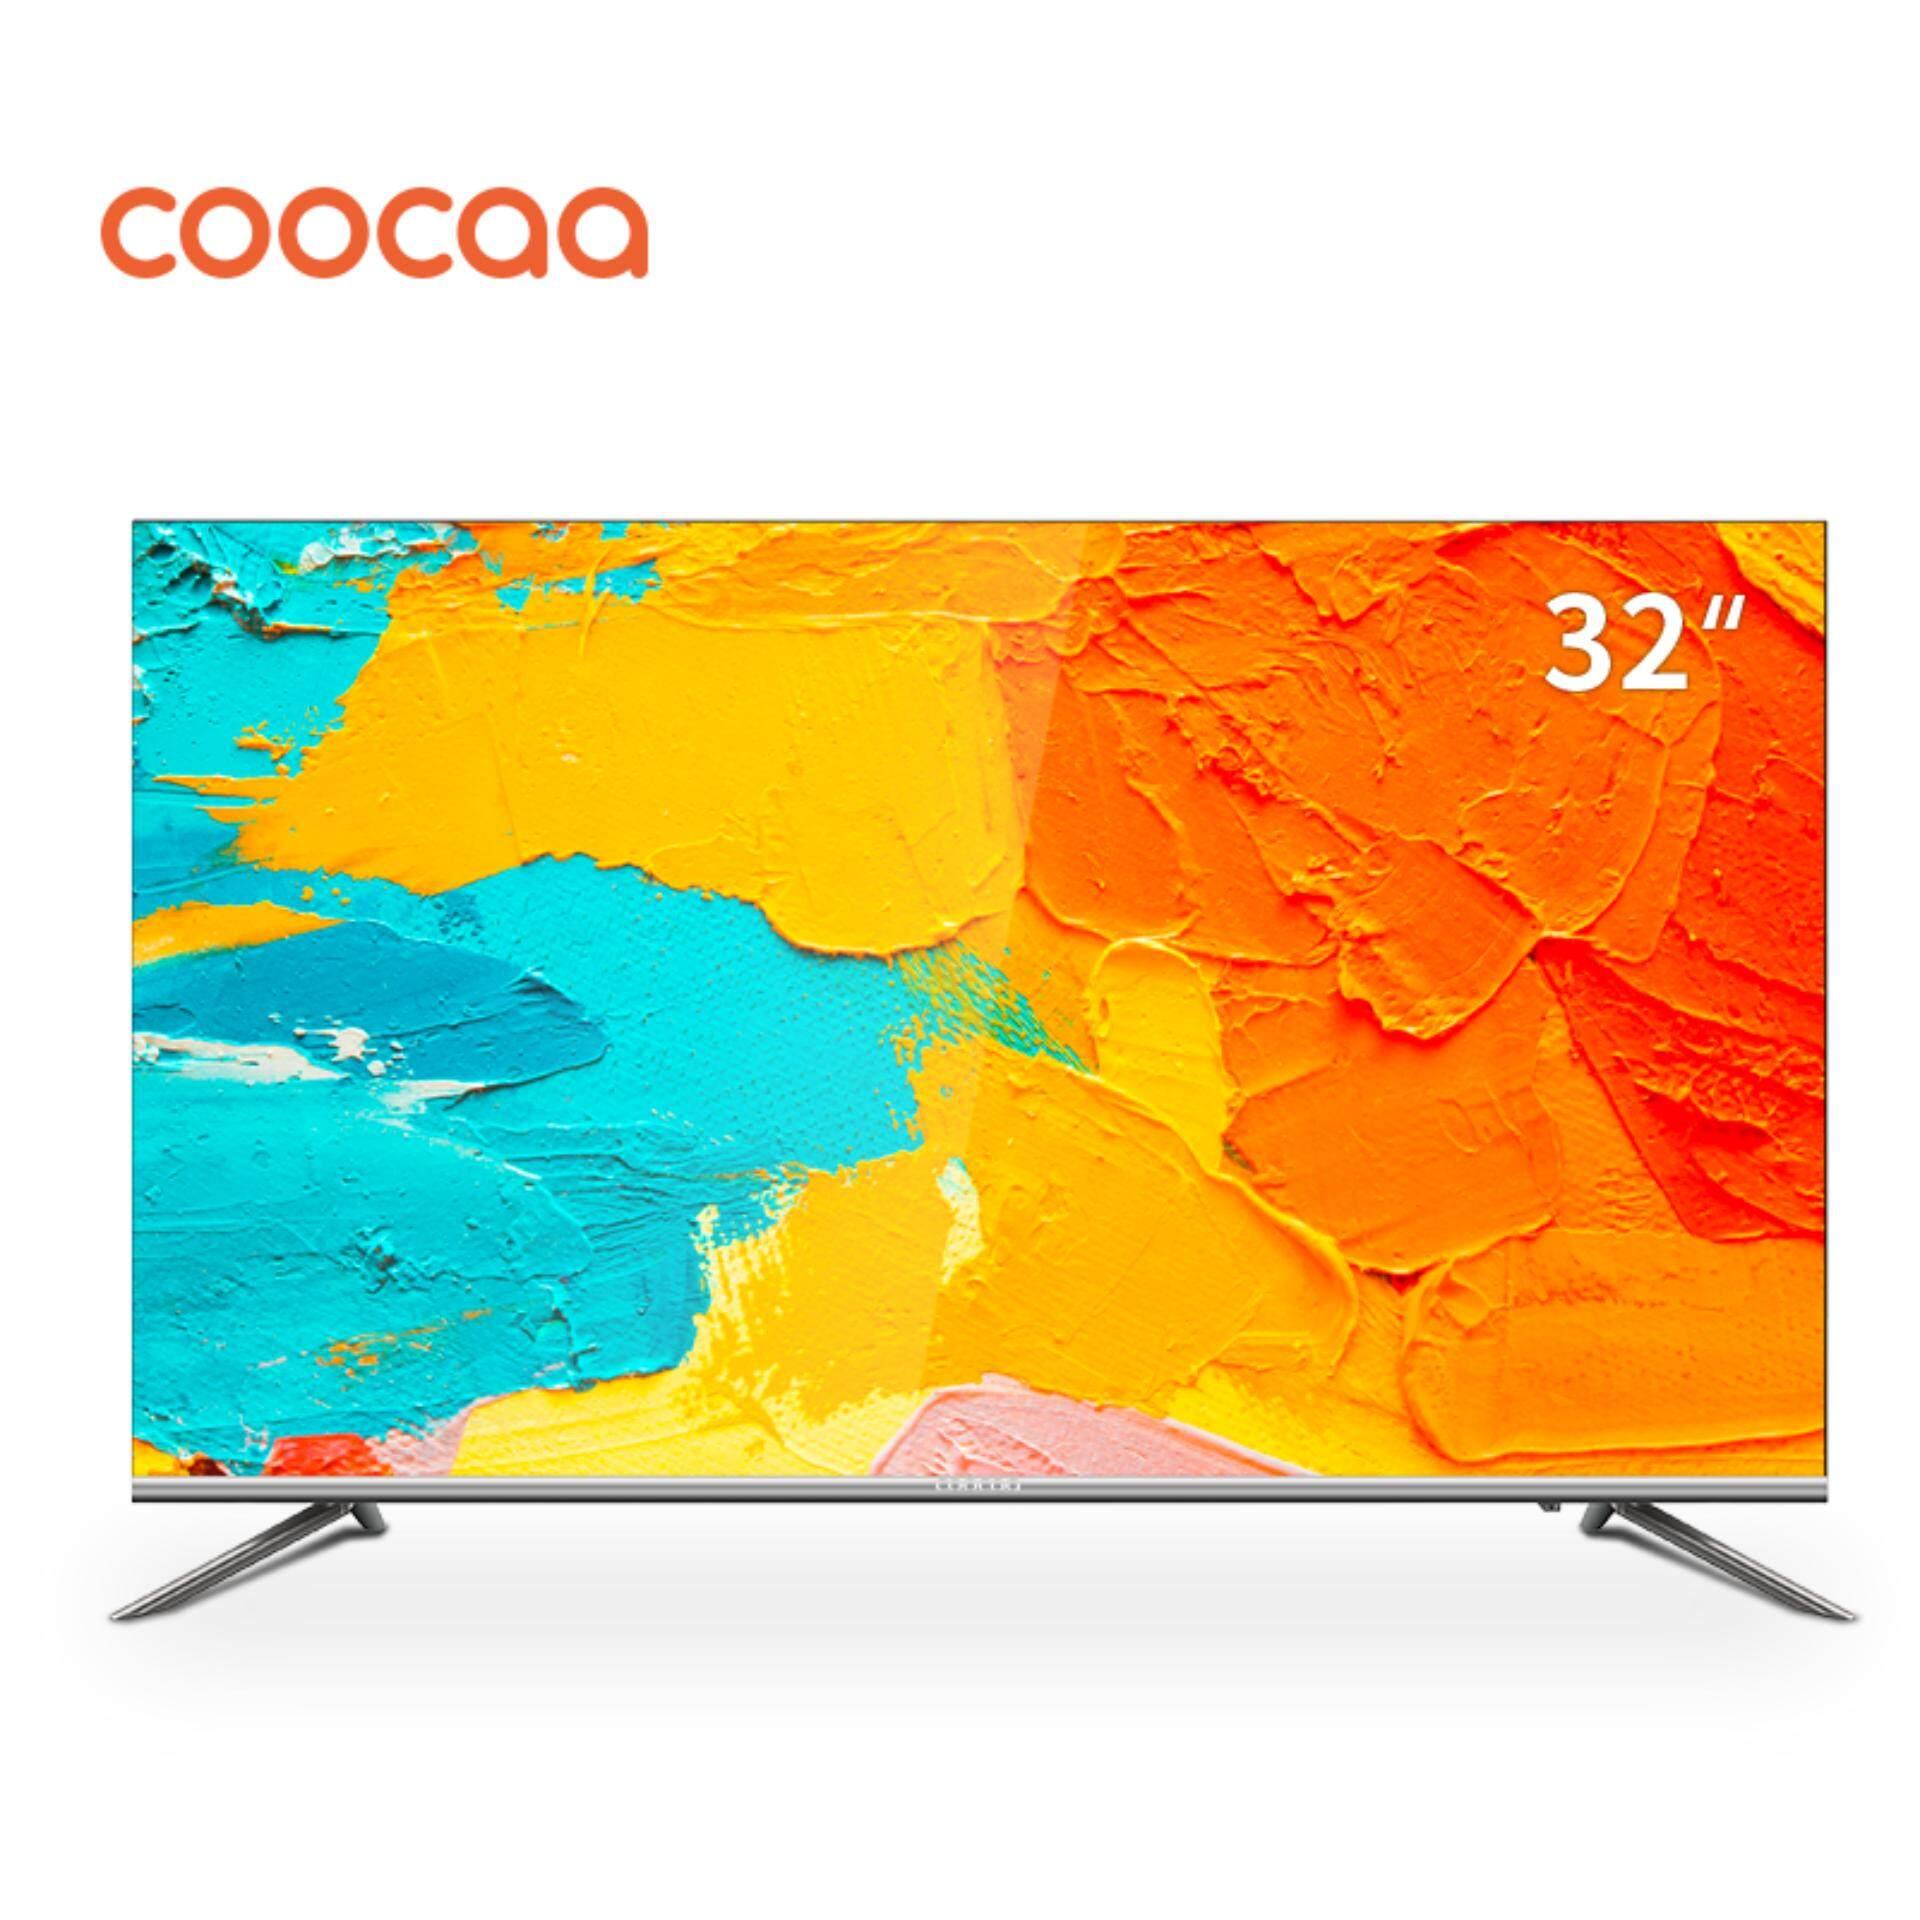 COOCAA 32 นิ้ว LED Smart internet Wifi HD Infinity Slim TV (รุ่น